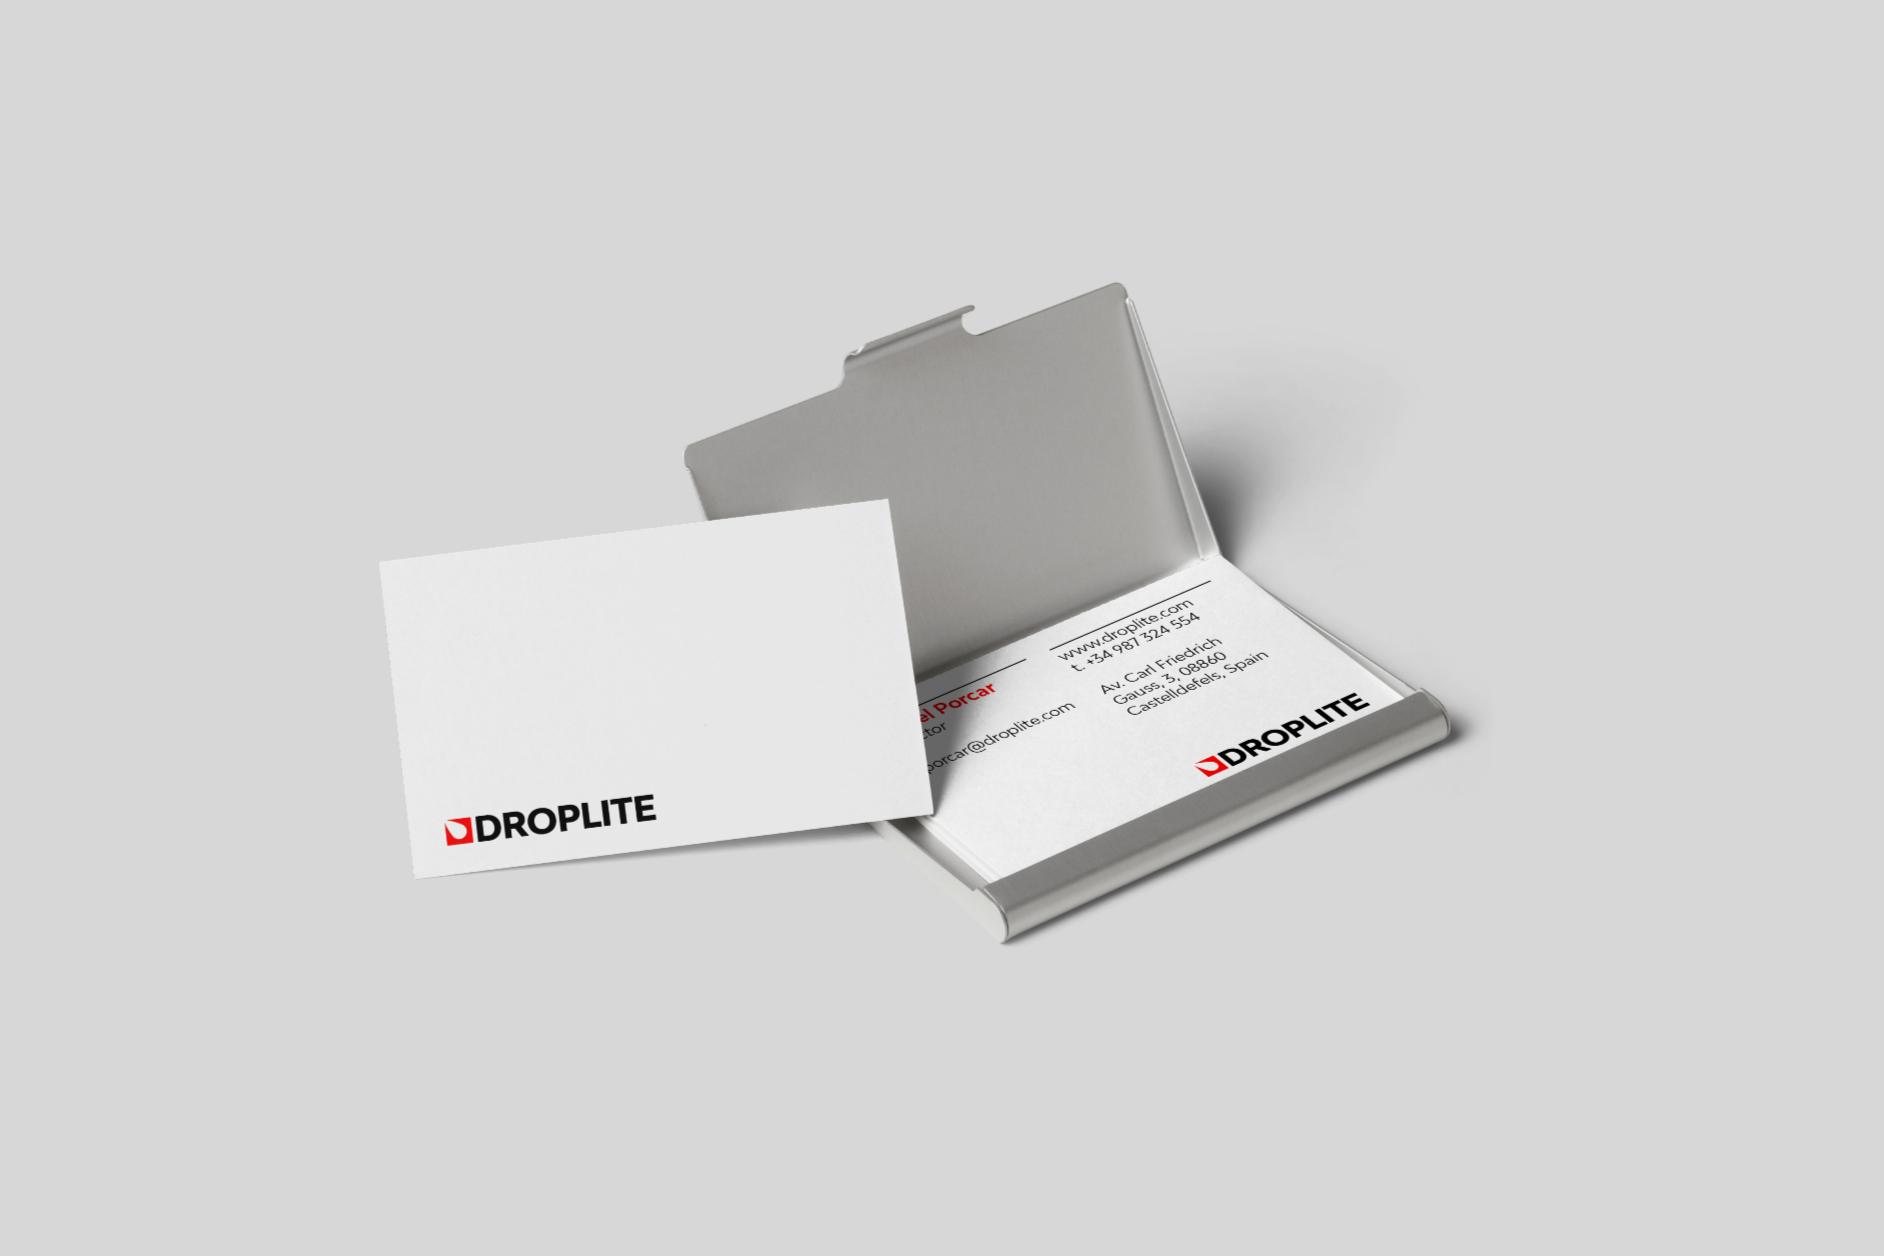 Bitflow-studio-droplite-logo-design-technology-startup-5